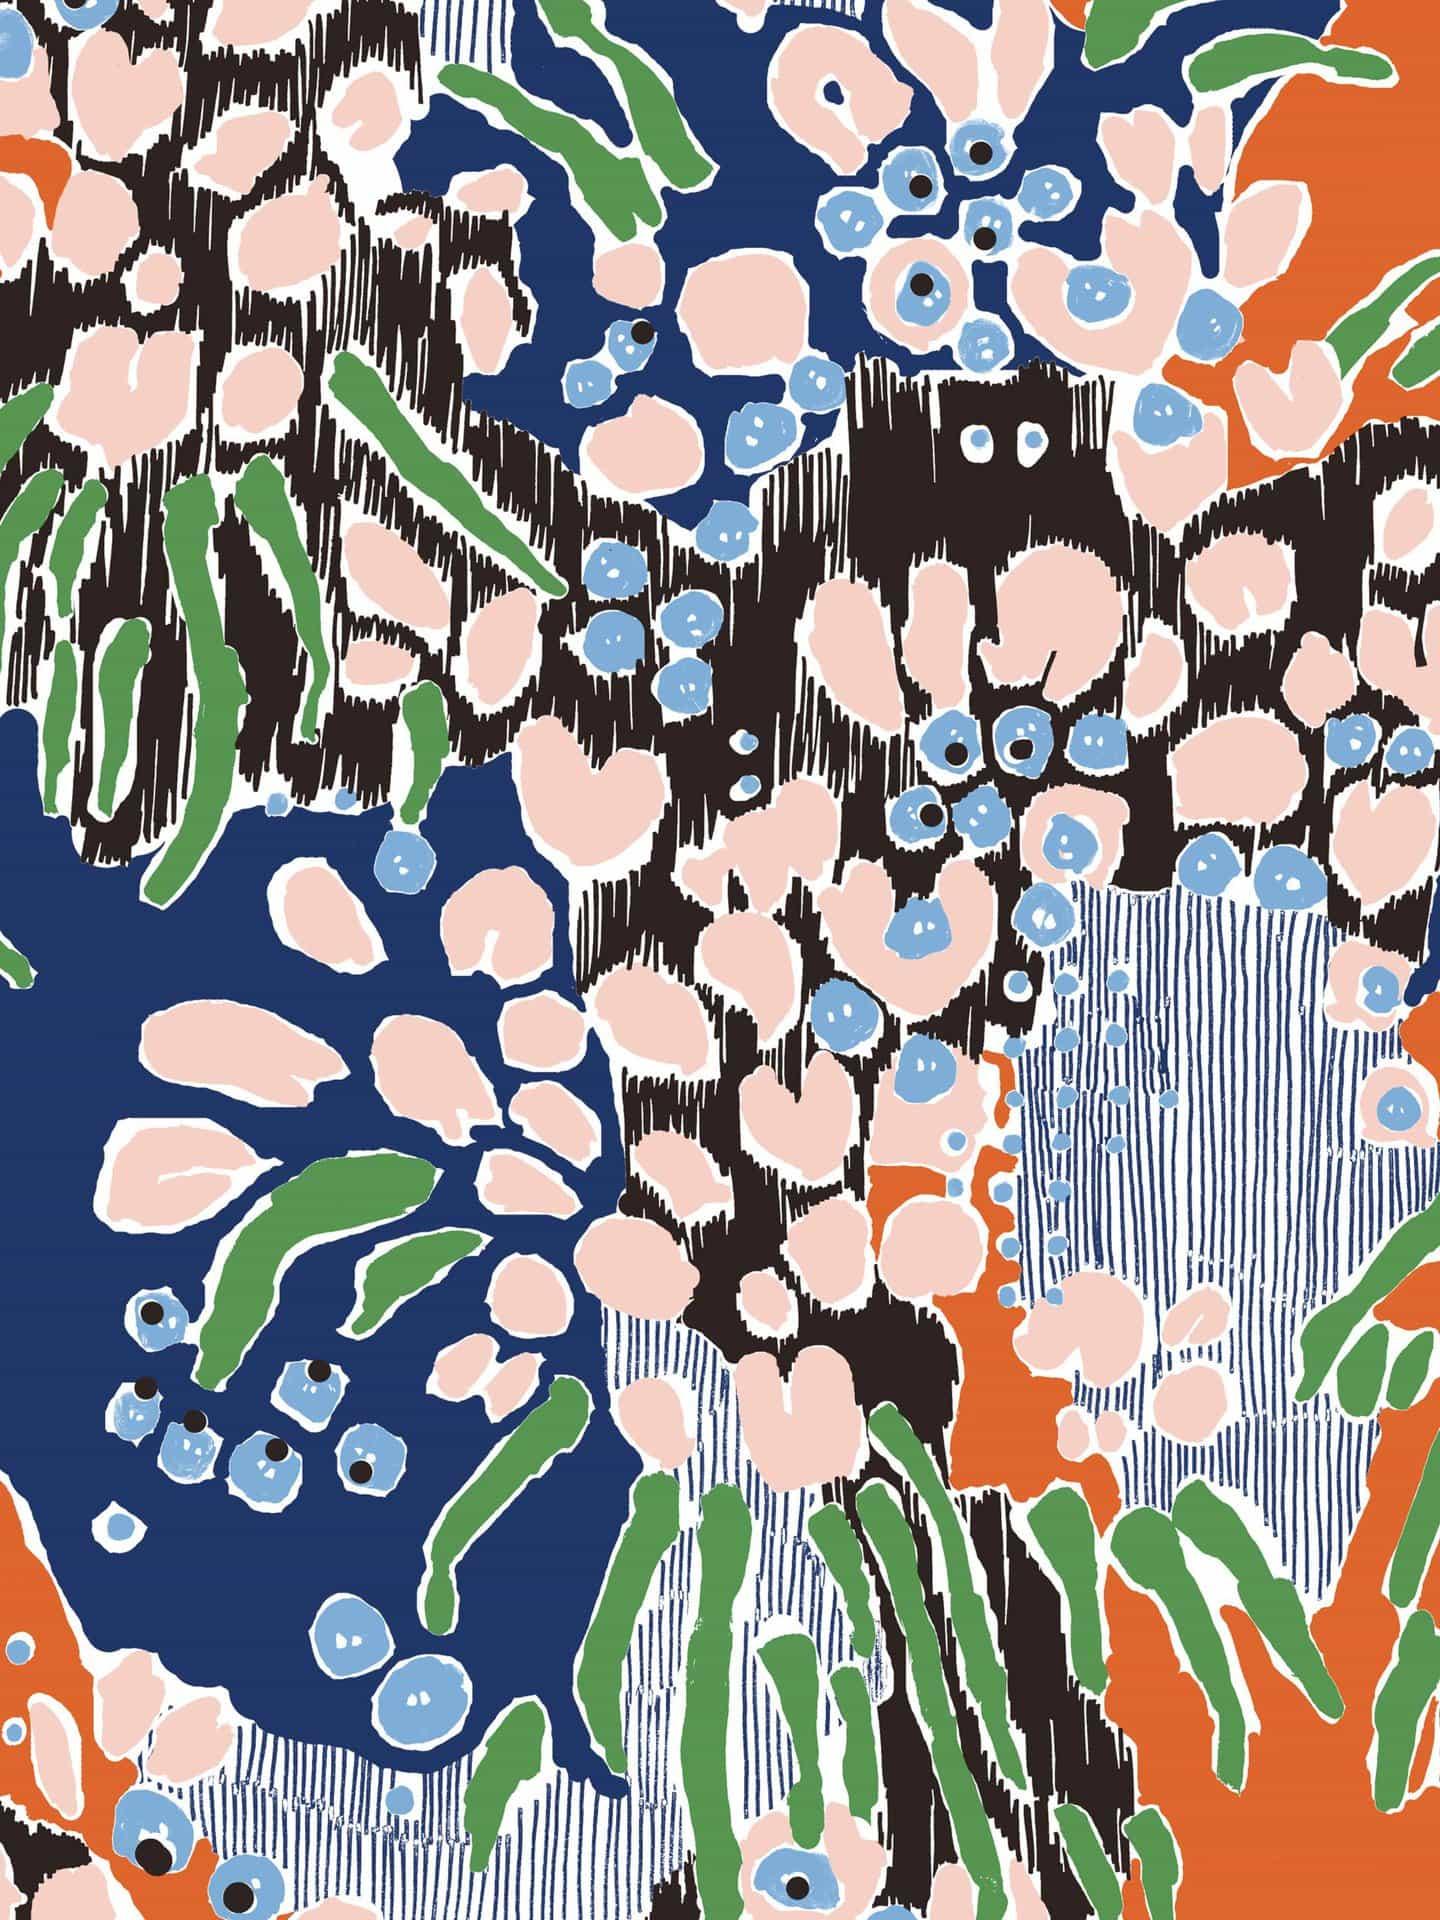 Katy Welsh: Underwater Floral (Copyright © Katy Welsh, 2021)